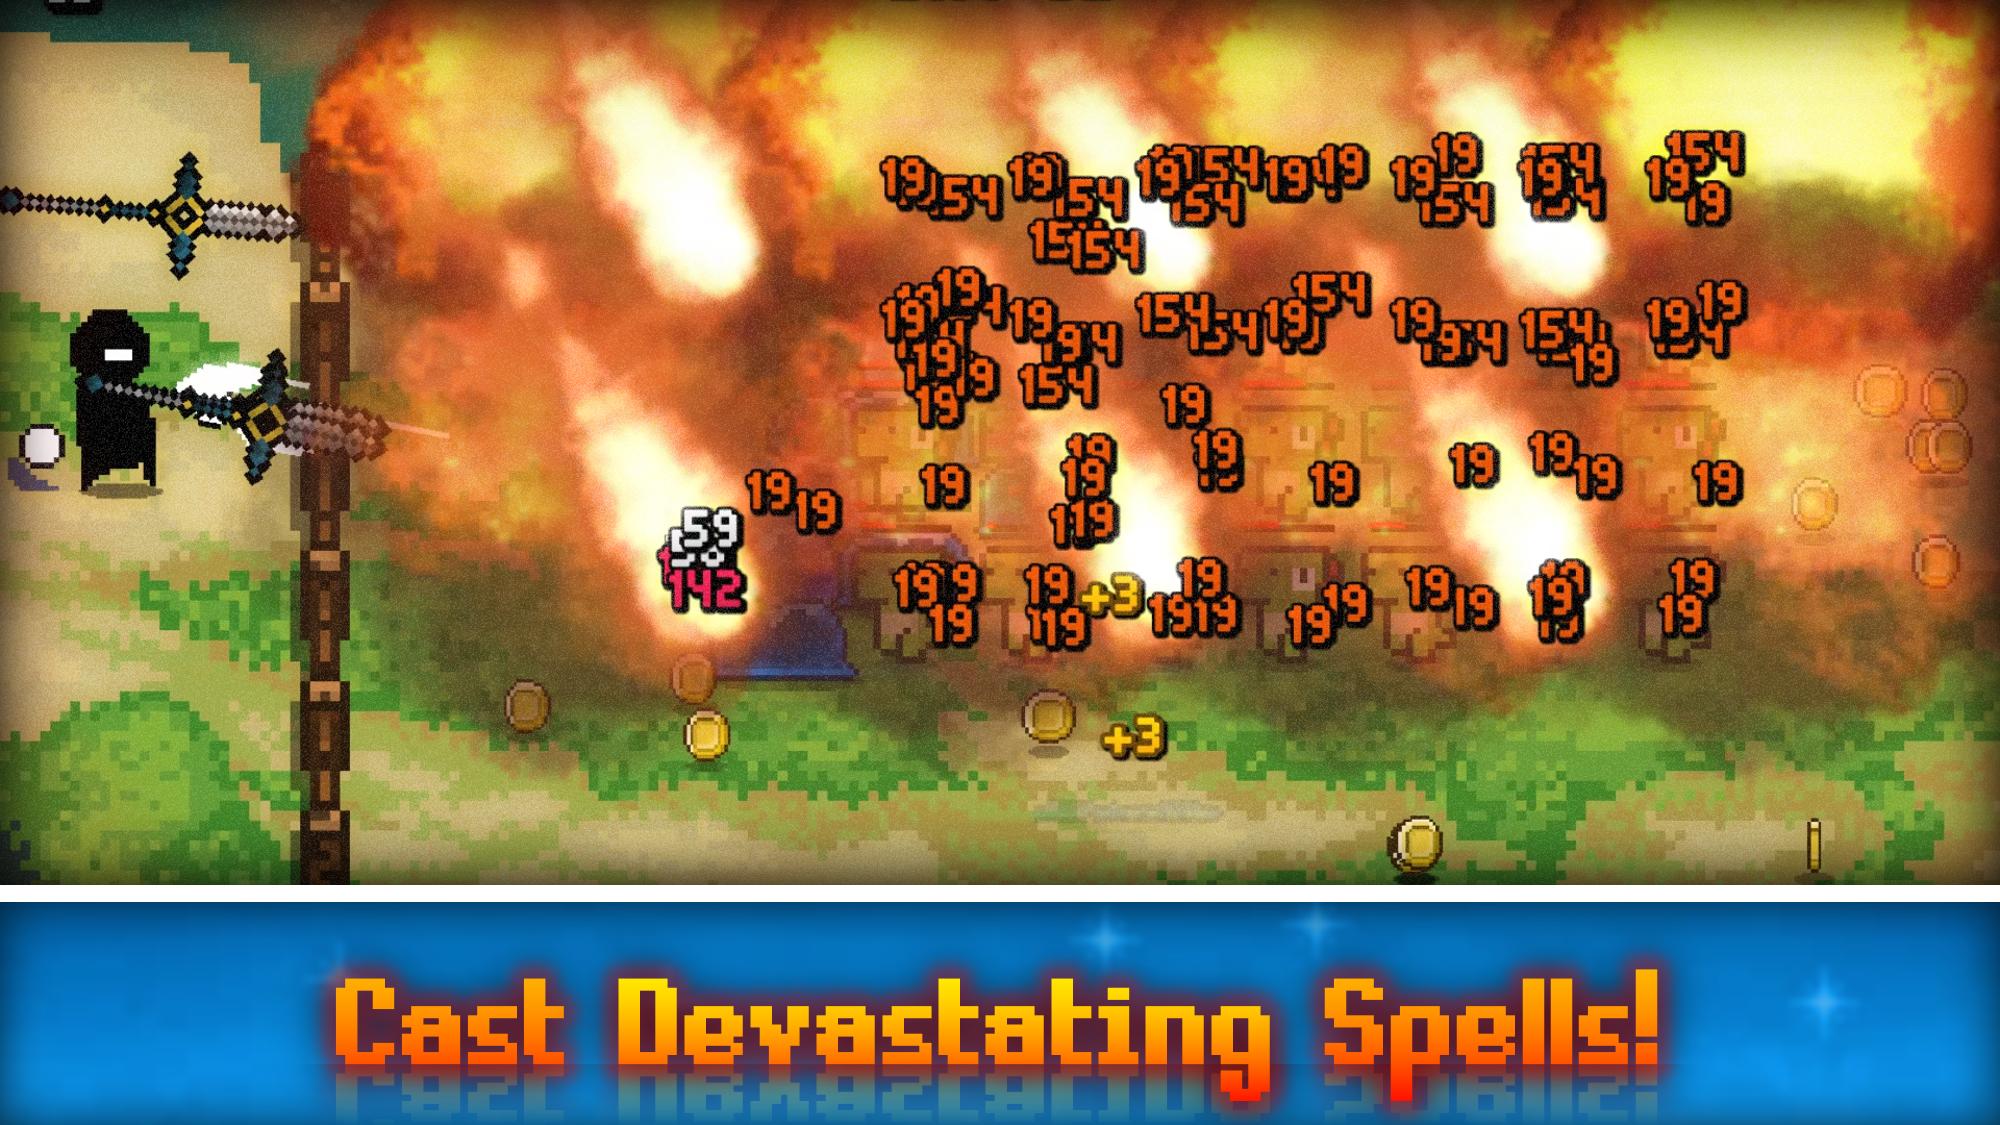 A devastating spell in the game: Armageddon.